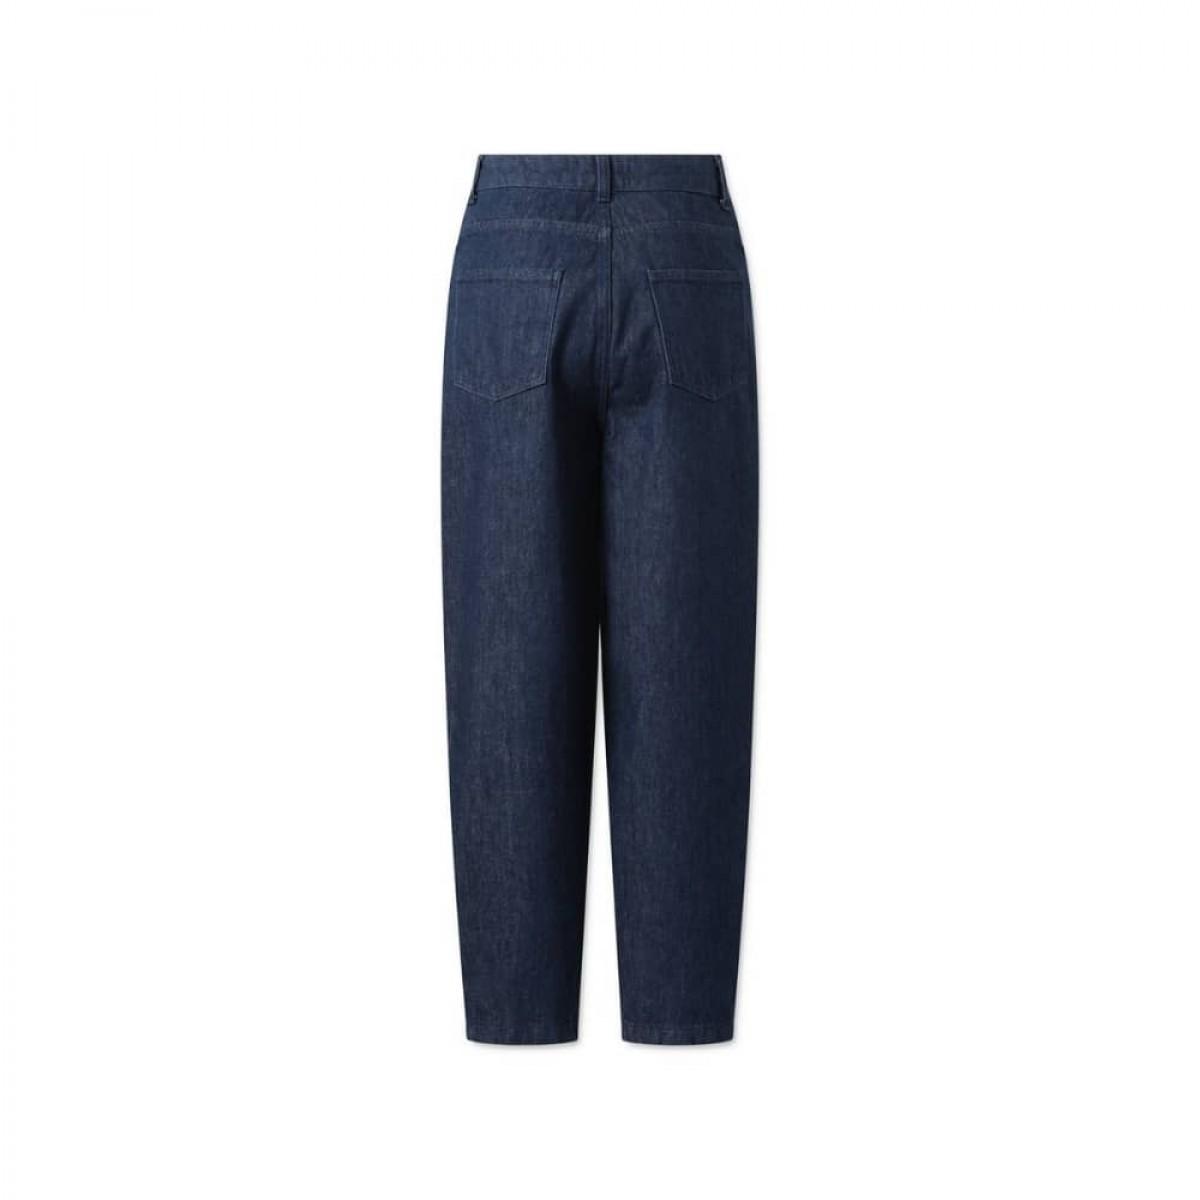 aston pants - denim blue - bagfra